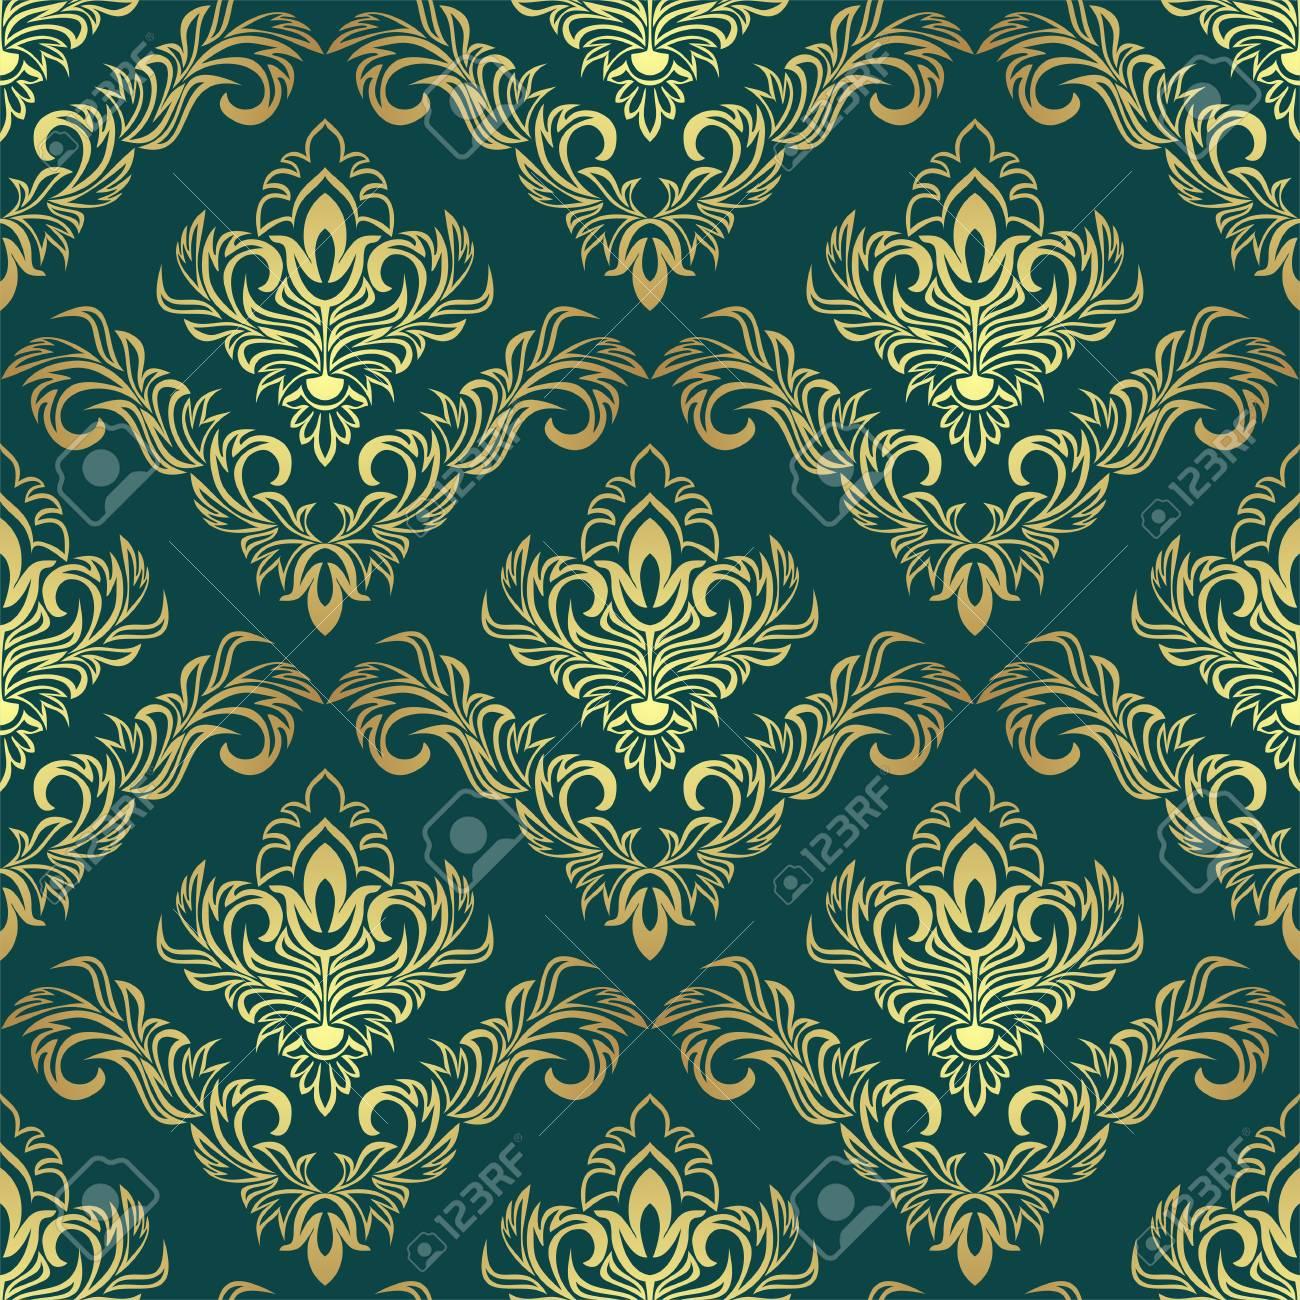 Luxury golden damask Pattern on dark green - 97509725